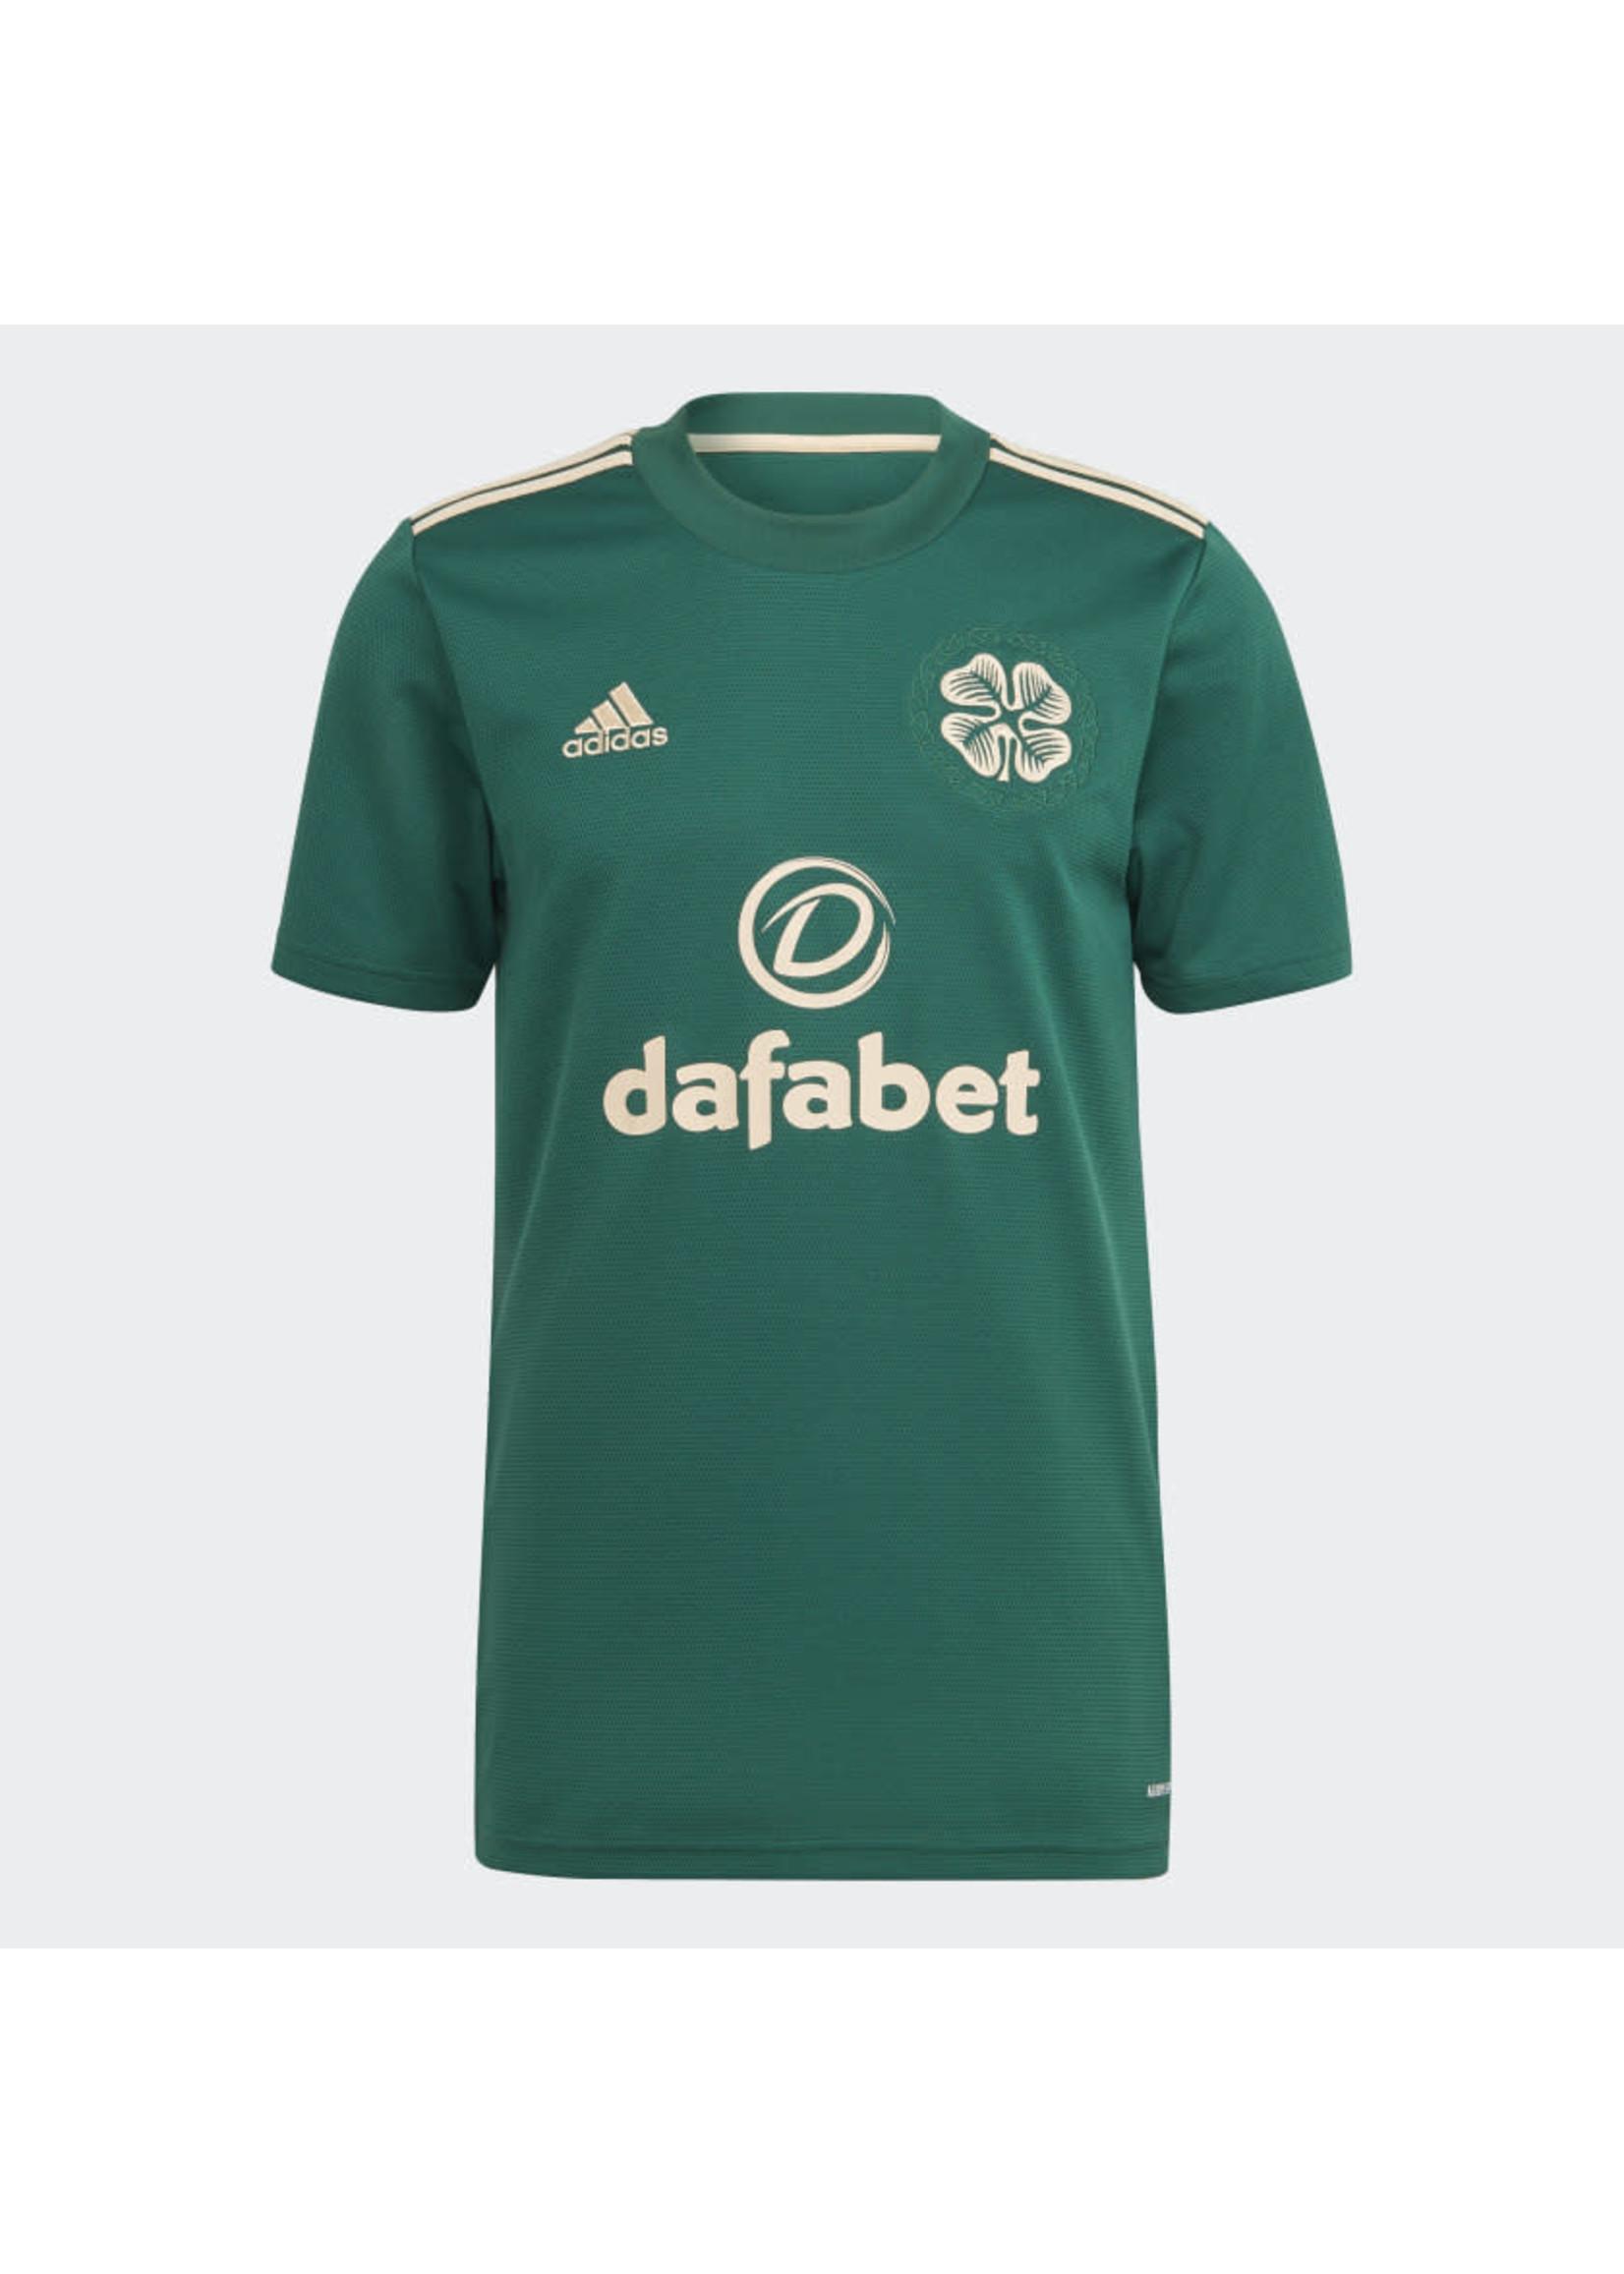 Adidas Celtic 21/22 Away Jersey Adult